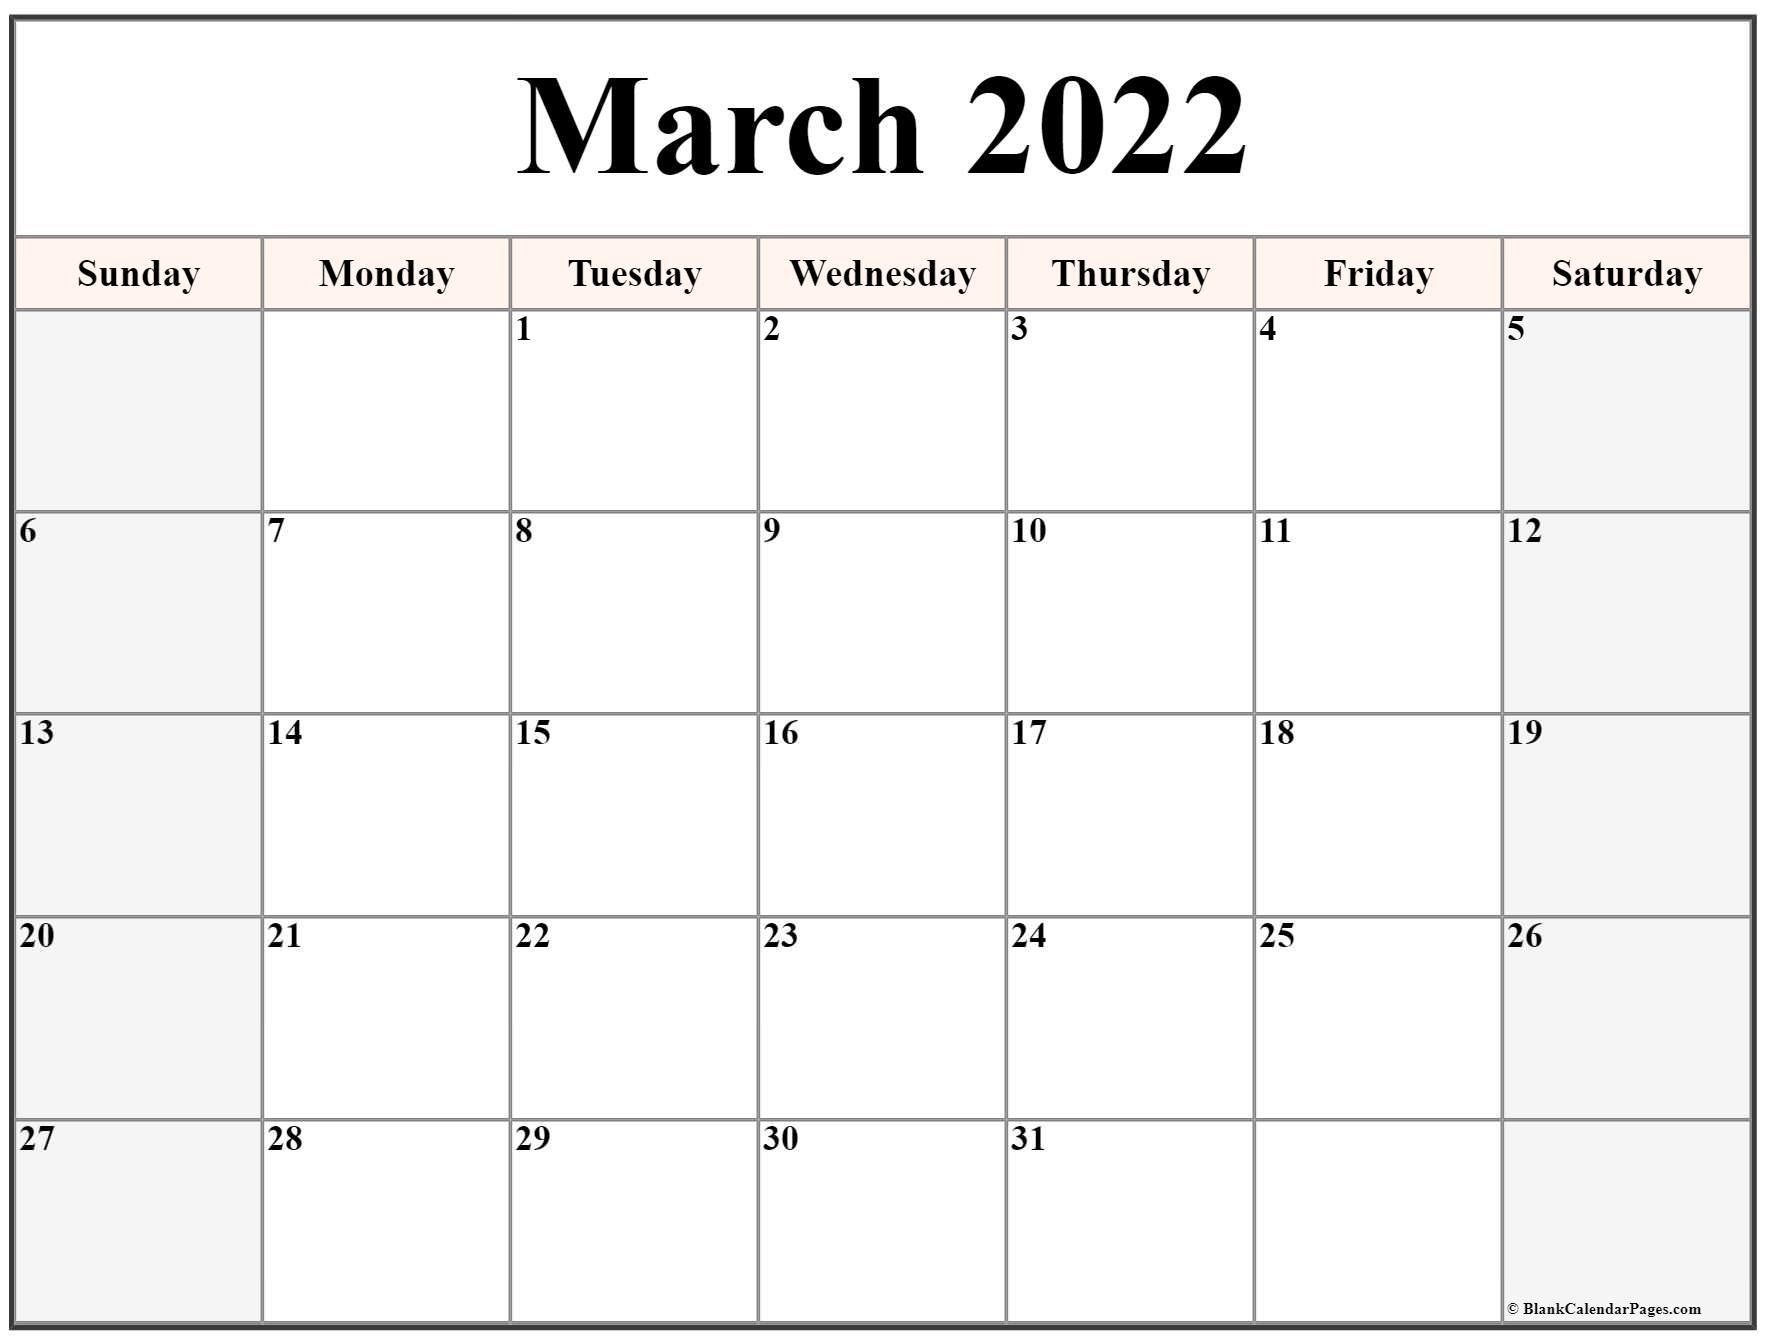 March 2022 Calendar | Free Printable Calendar Templates Pertaining To March April 2022 Calendar Print